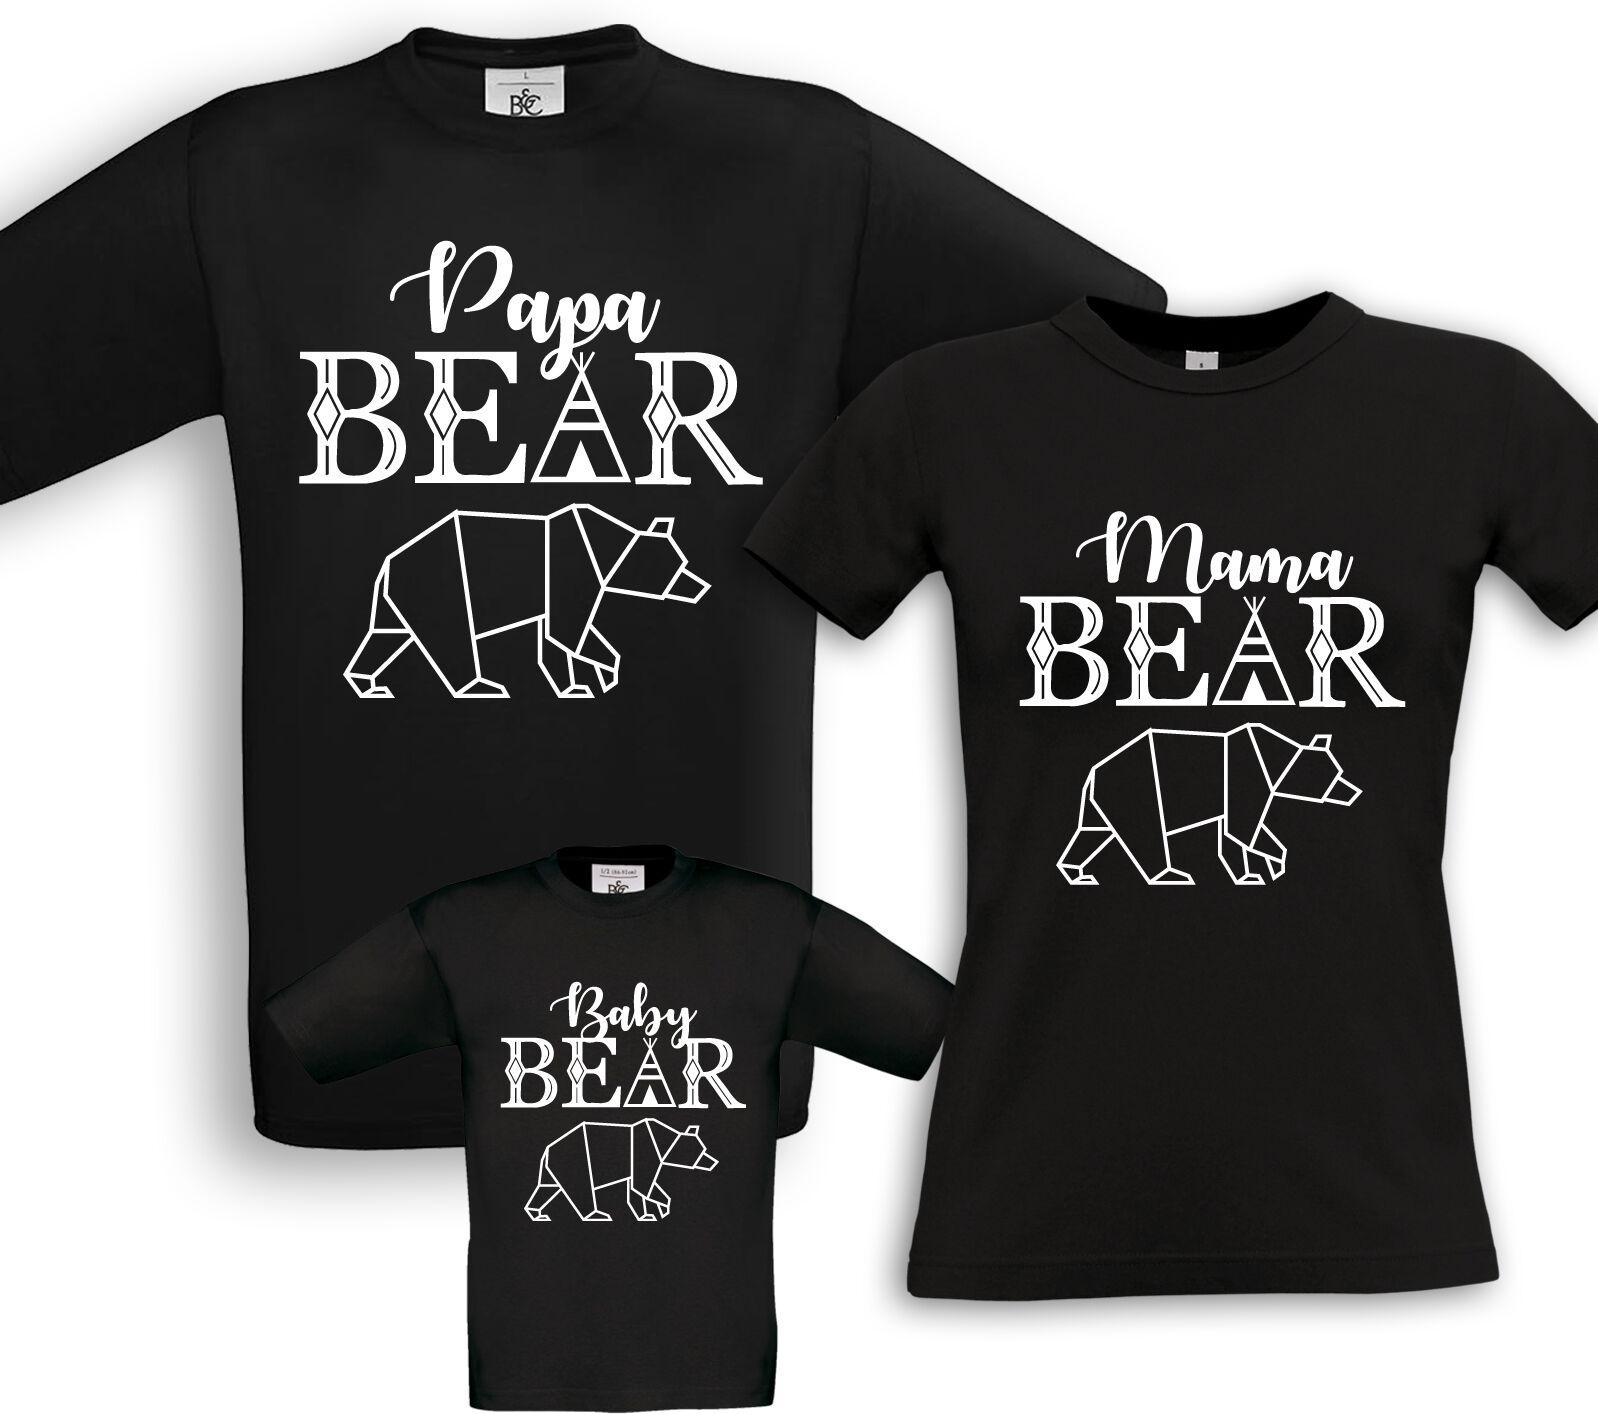 Family Bear-famiglie partner shirts-FUN COMPLEANNO BATTESIMO REGALO papà mamma